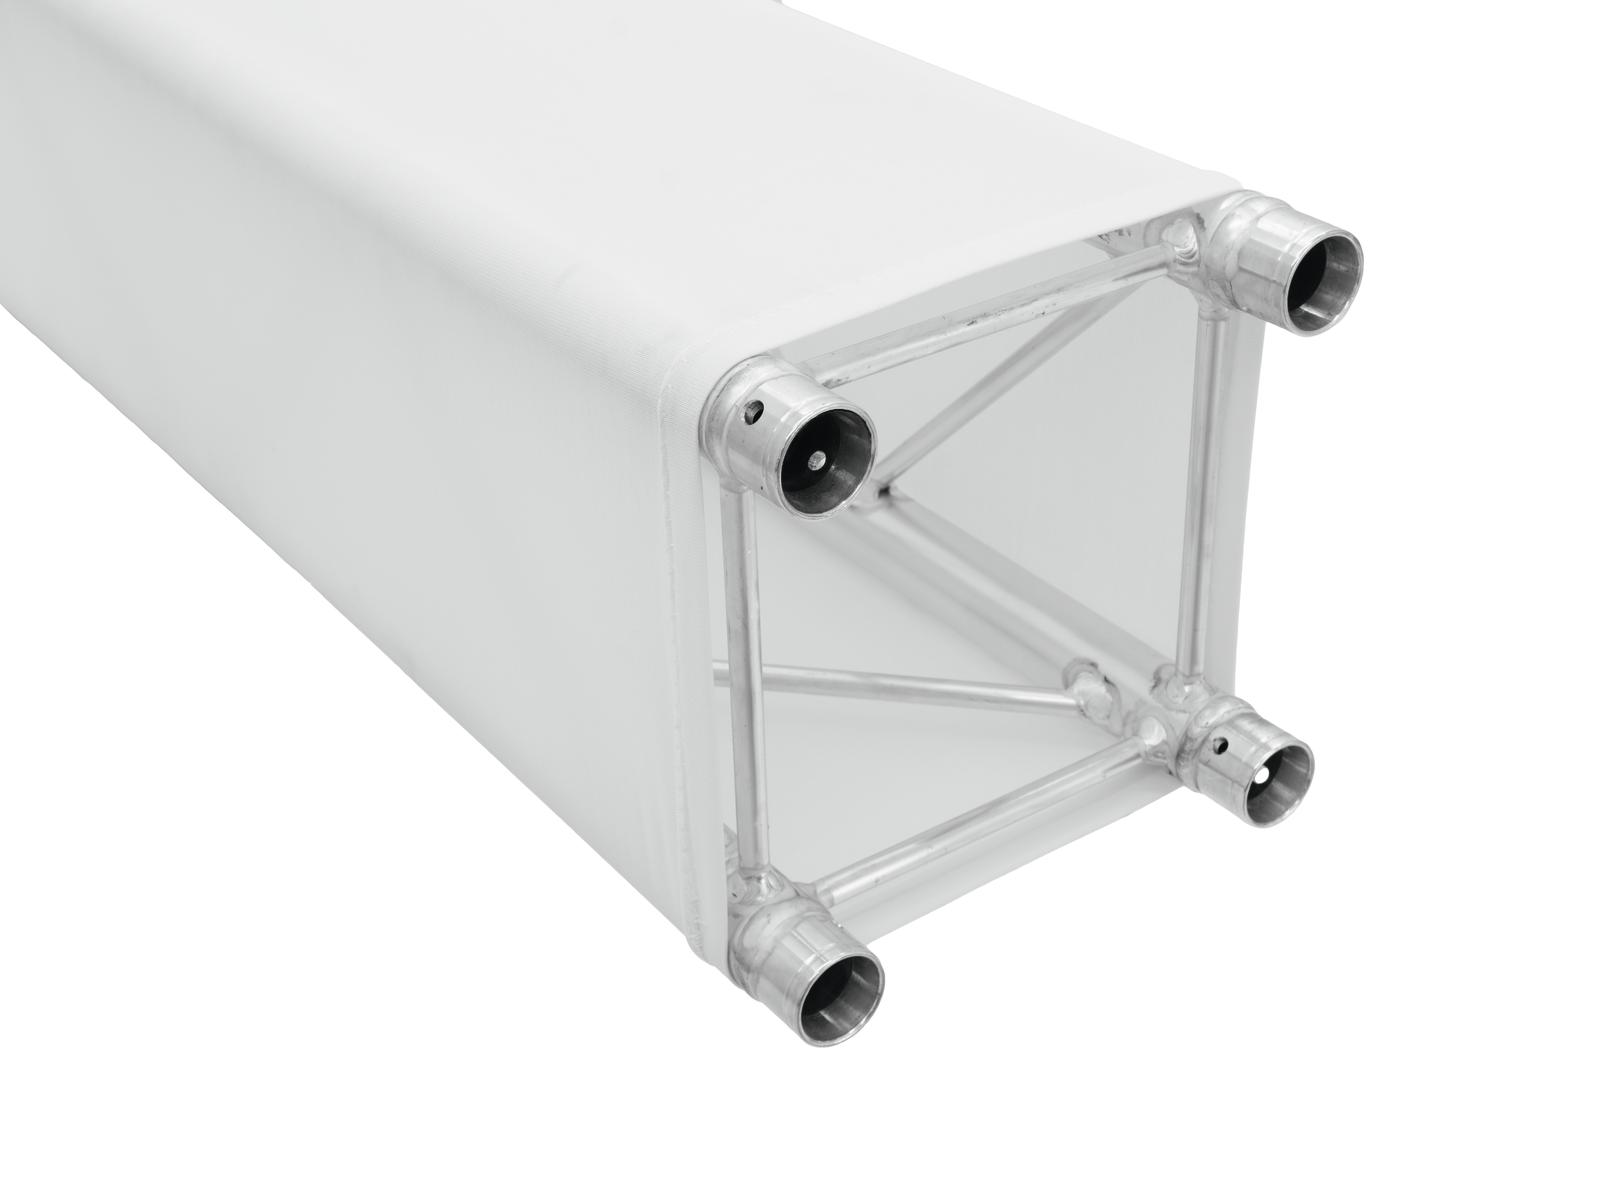 ESPANDERE Trusscover für Decolock 200 cm bianco